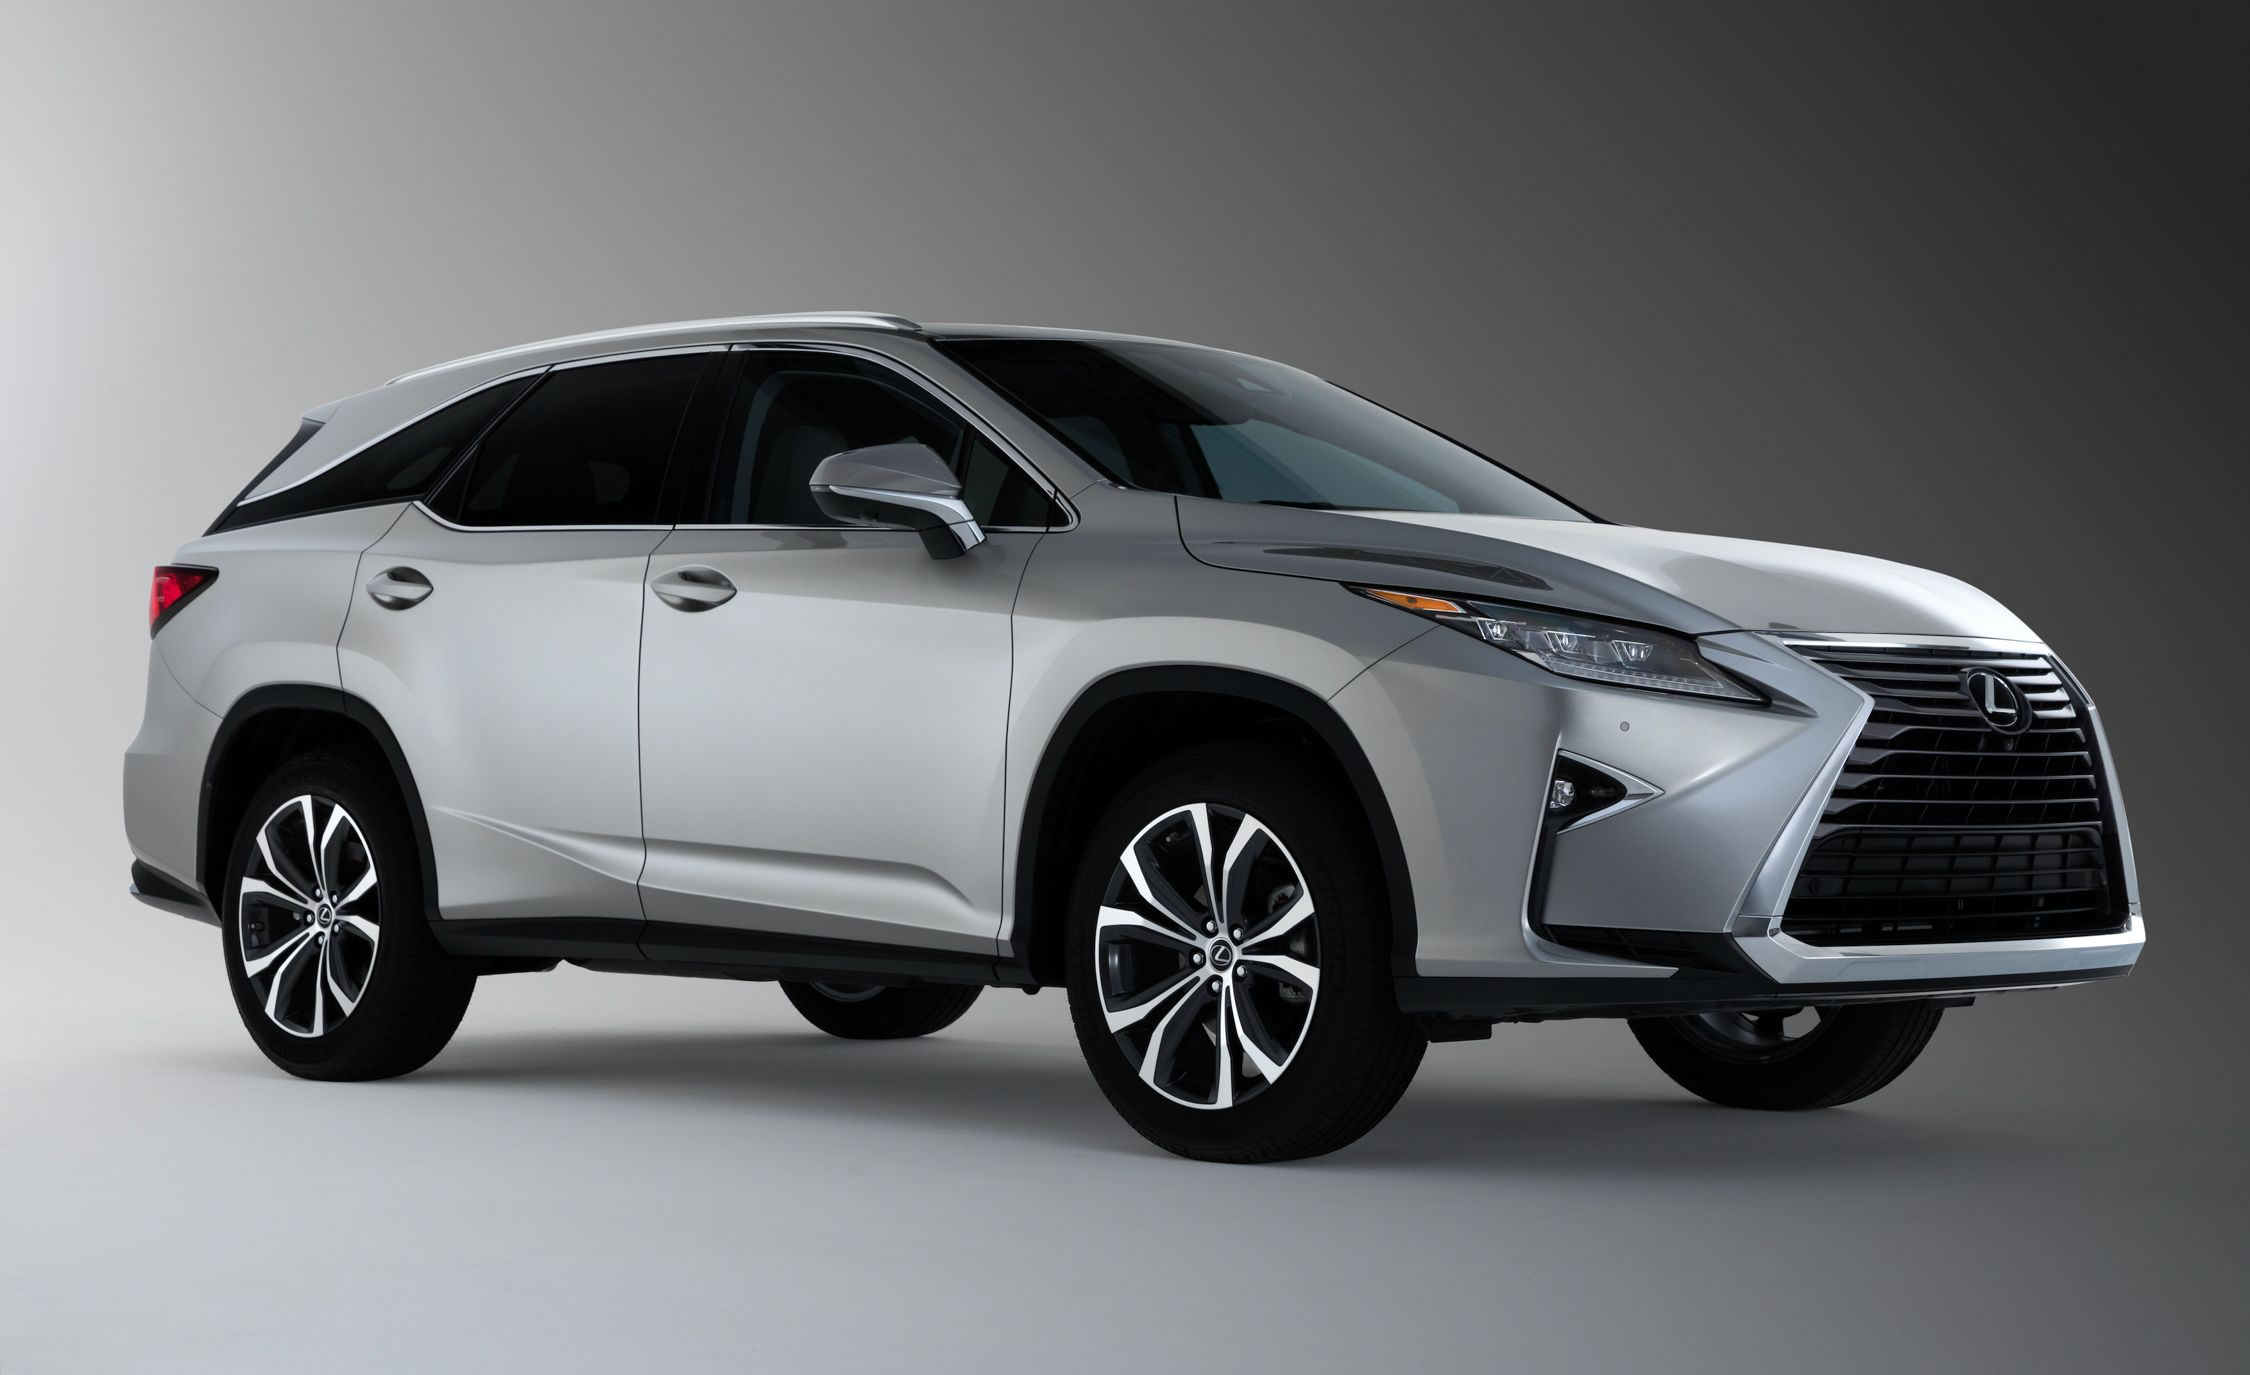 https://hips.hearstapps.com/amv-prod-cad-assets.s3.amazonaws.com/wp-content/uploads/2017/11/2018-Lexus-RX-L-350-101.jpg